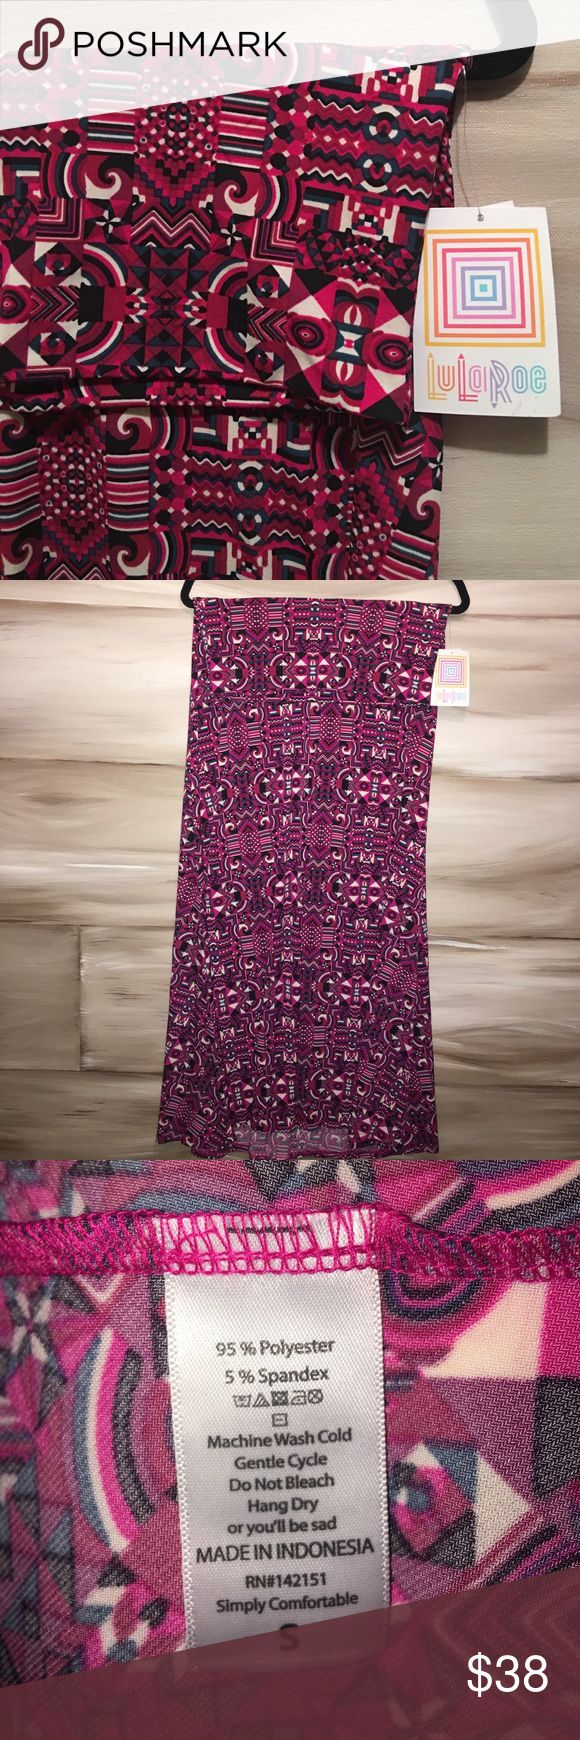 Lularoe Maxi Skirt Cool, slinky fabric! Unique designs made up of reds, pinks, black, ivory and dark marine blue! LuLaRoe Skirts Maxi